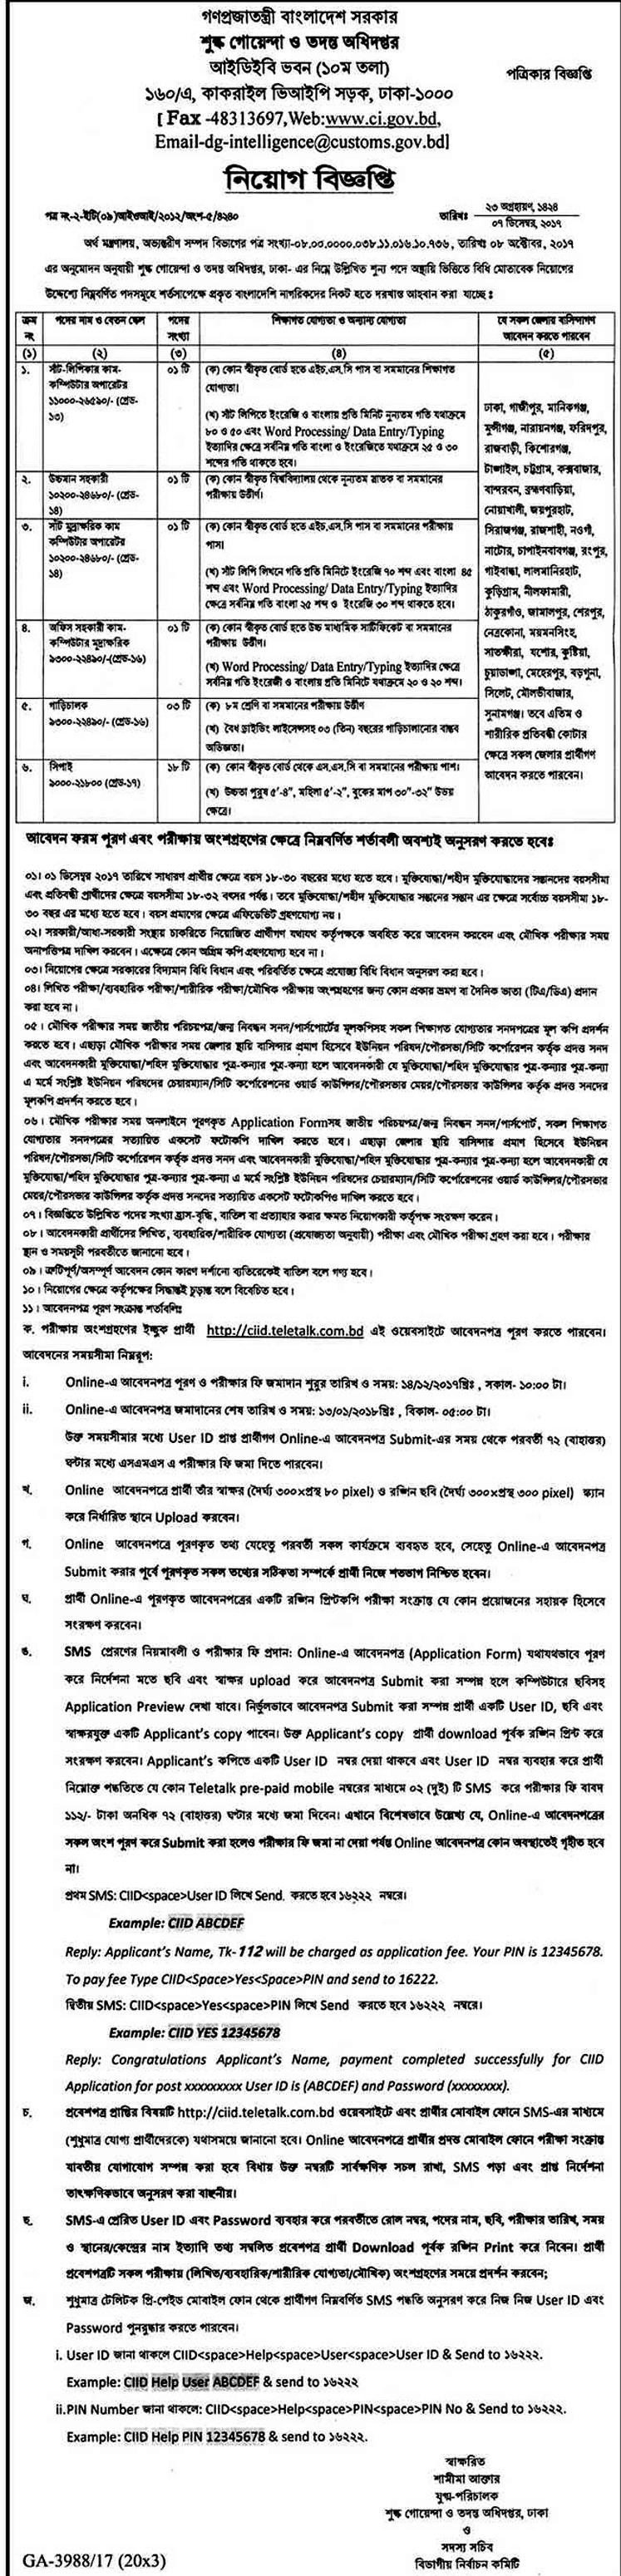 Finance Ministry Job Circular 2017